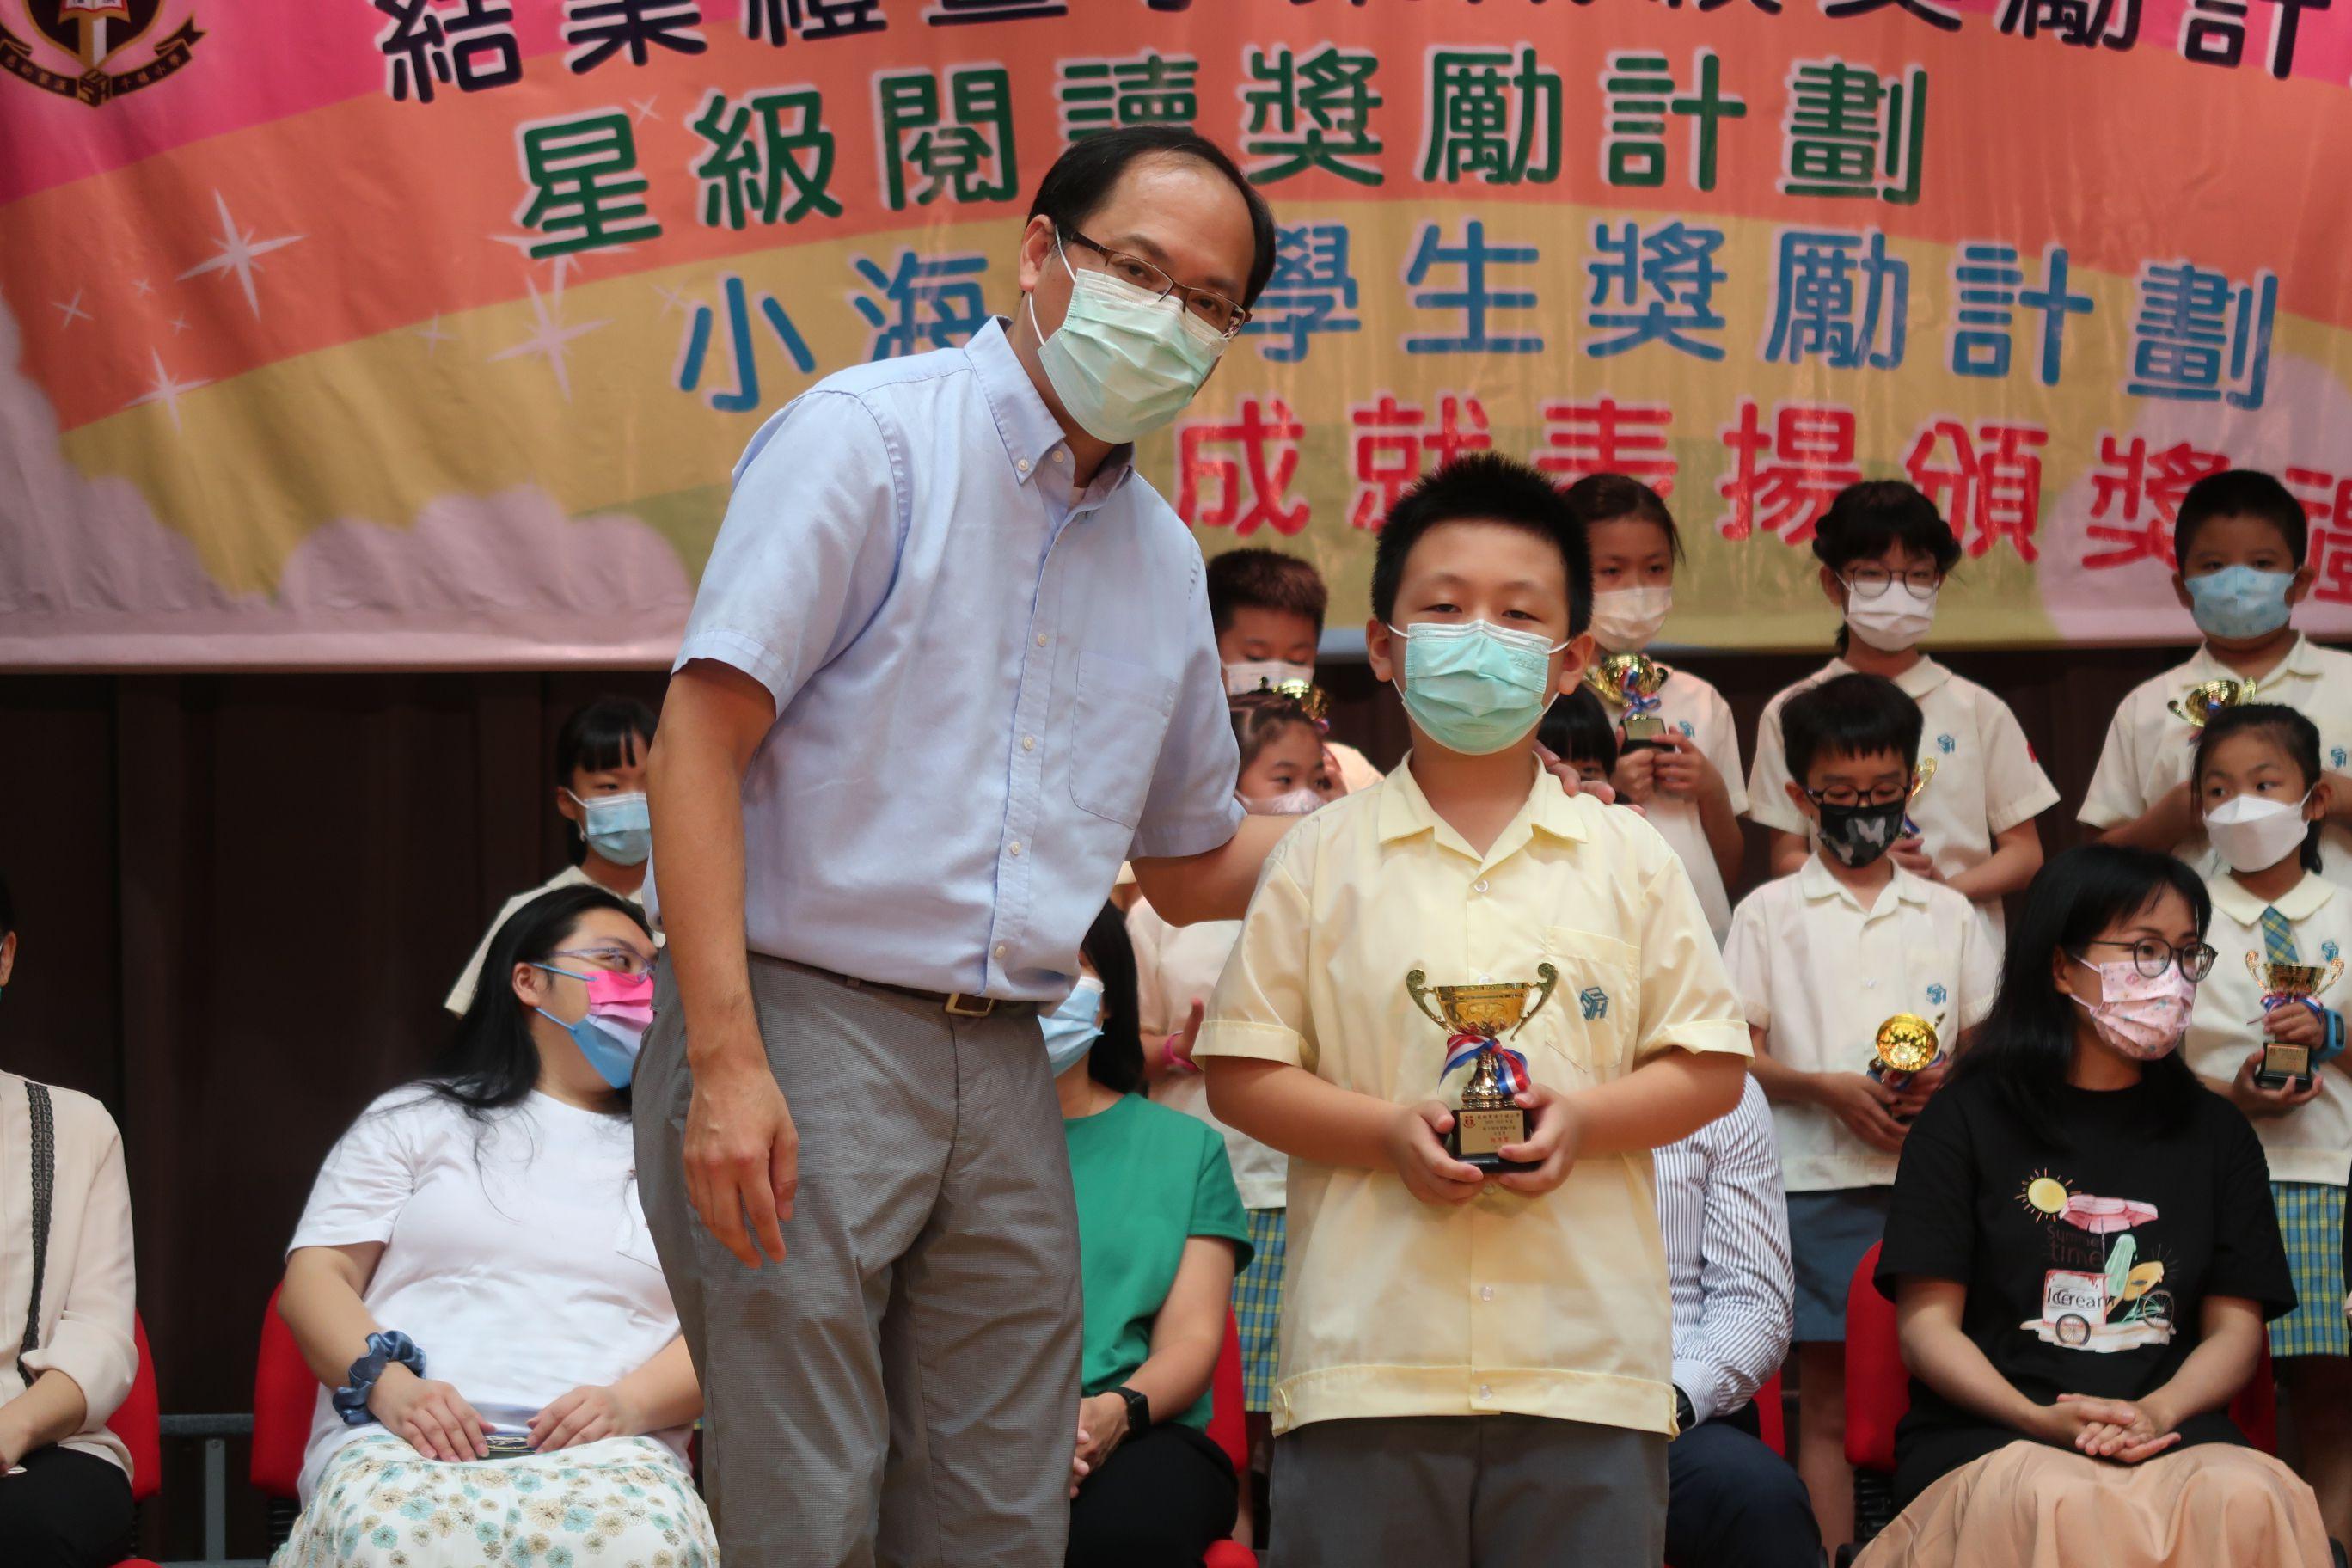 https://syh.edu.hk/sites/default/files/img_5863.jpg